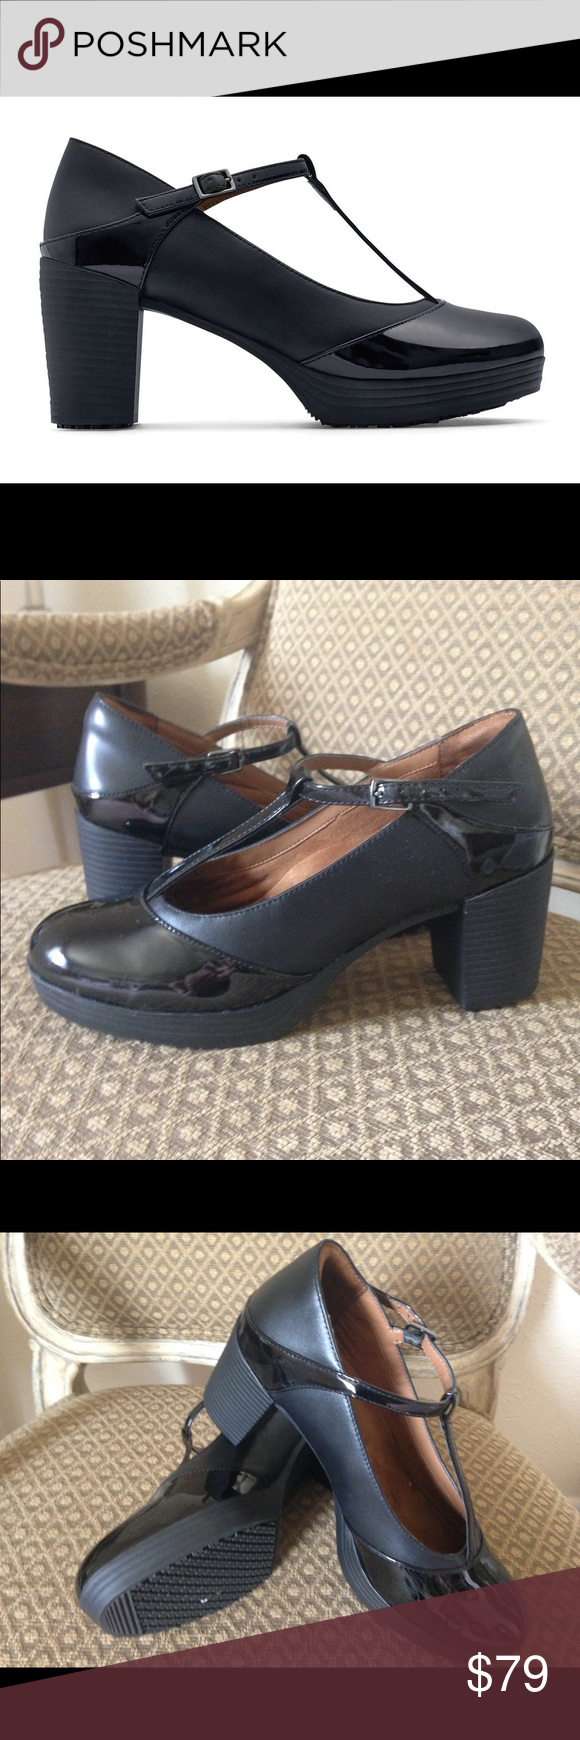 Women S Black Dress Shoes Like New Women S Dress Shoe Style 57280 Shoes For Crews Faux Leathe Womens Black Dress Shoes Dress Shoes Womens Black Dress Shoes [ 1740 x 580 Pixel ]